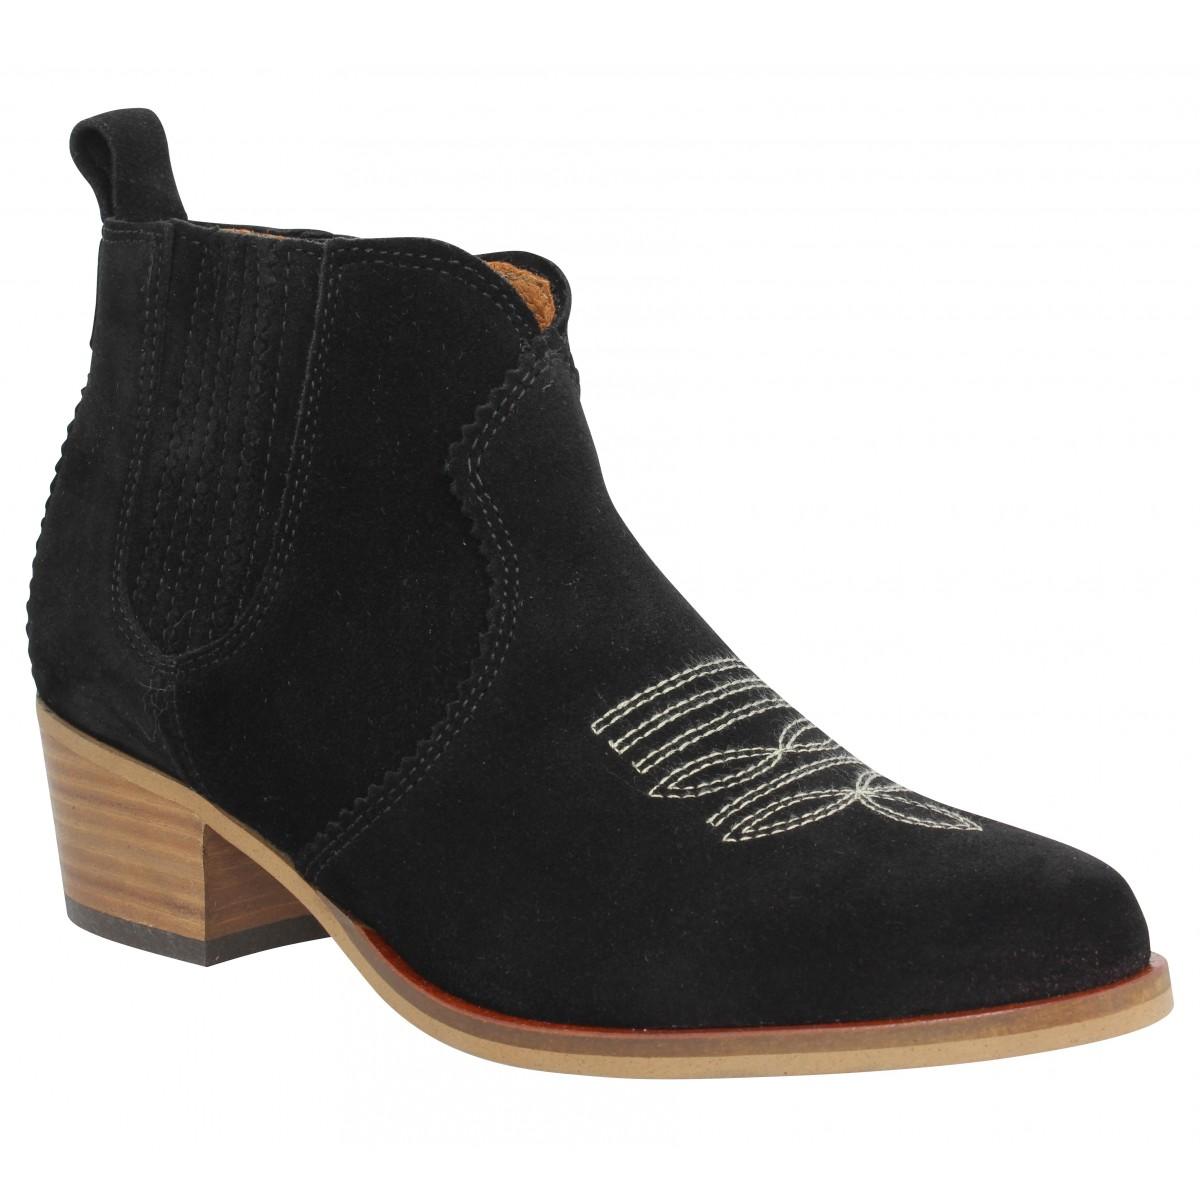 Bottines SCHMOOVE Polly Boots suede Femme Noir